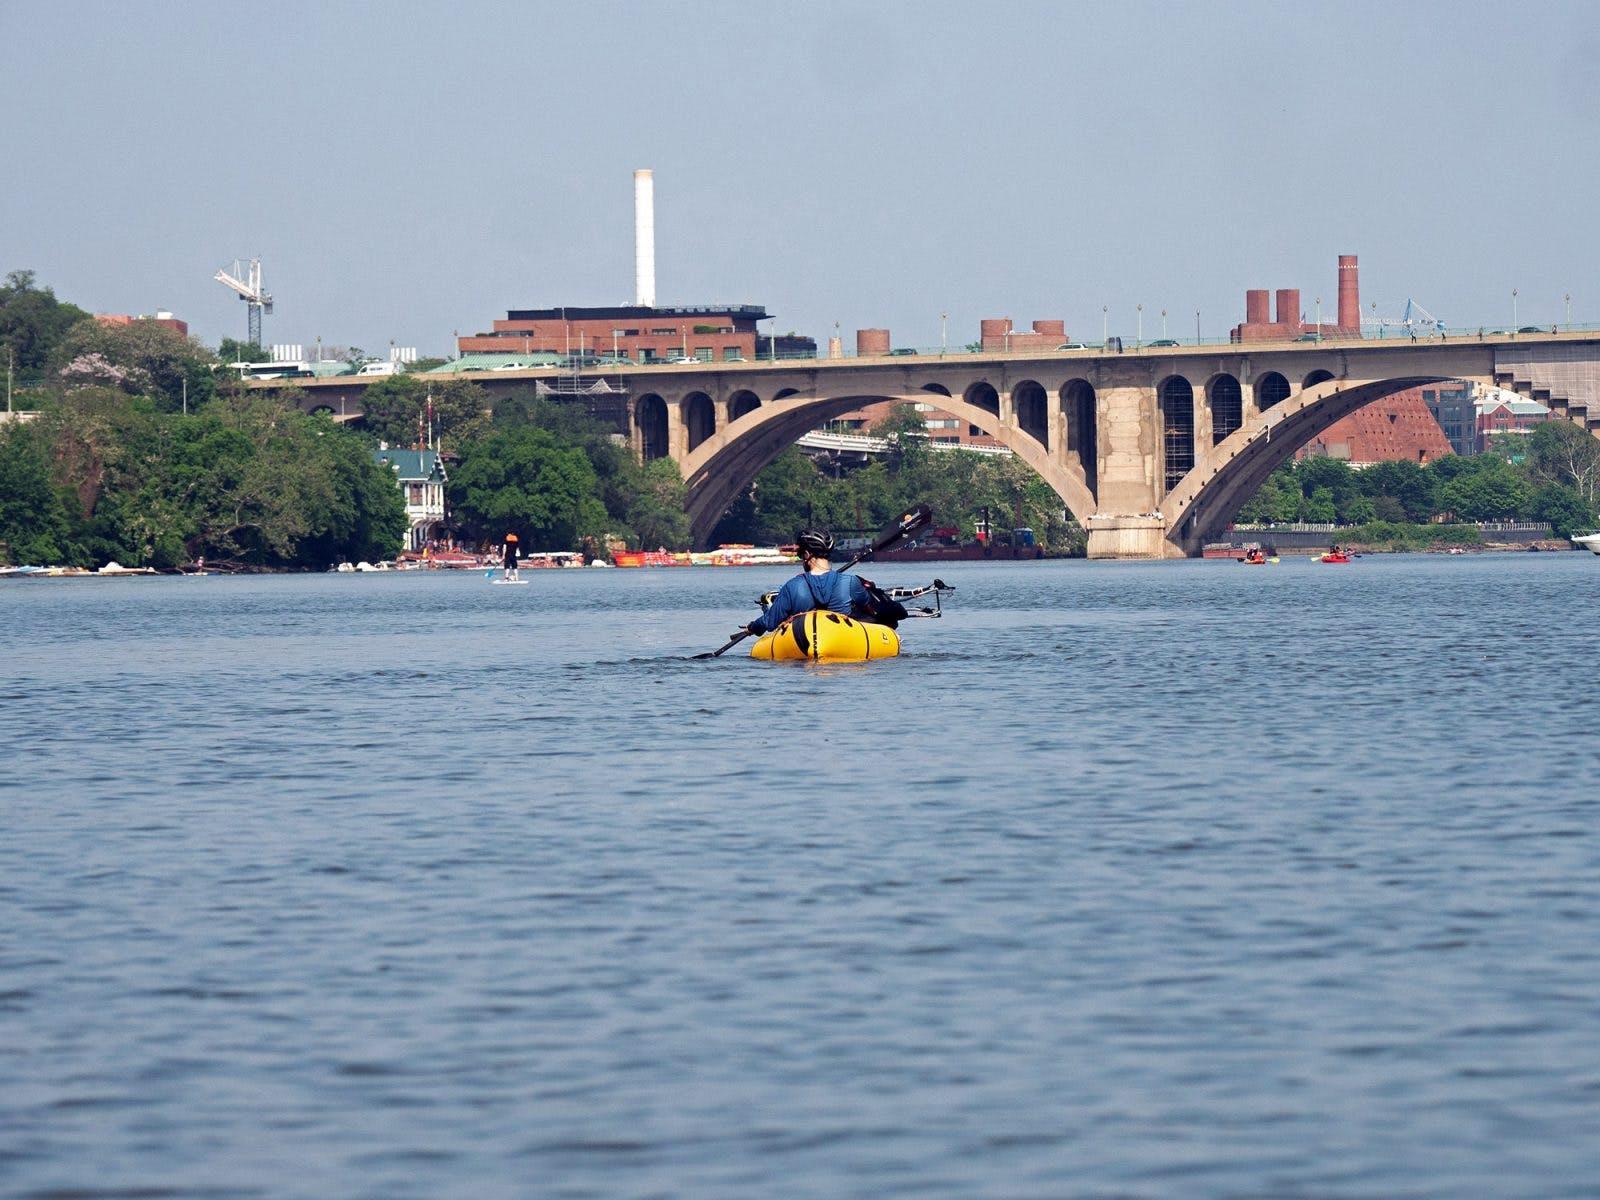 Day one, the guys paddled under Key Bridge, Georgetown.